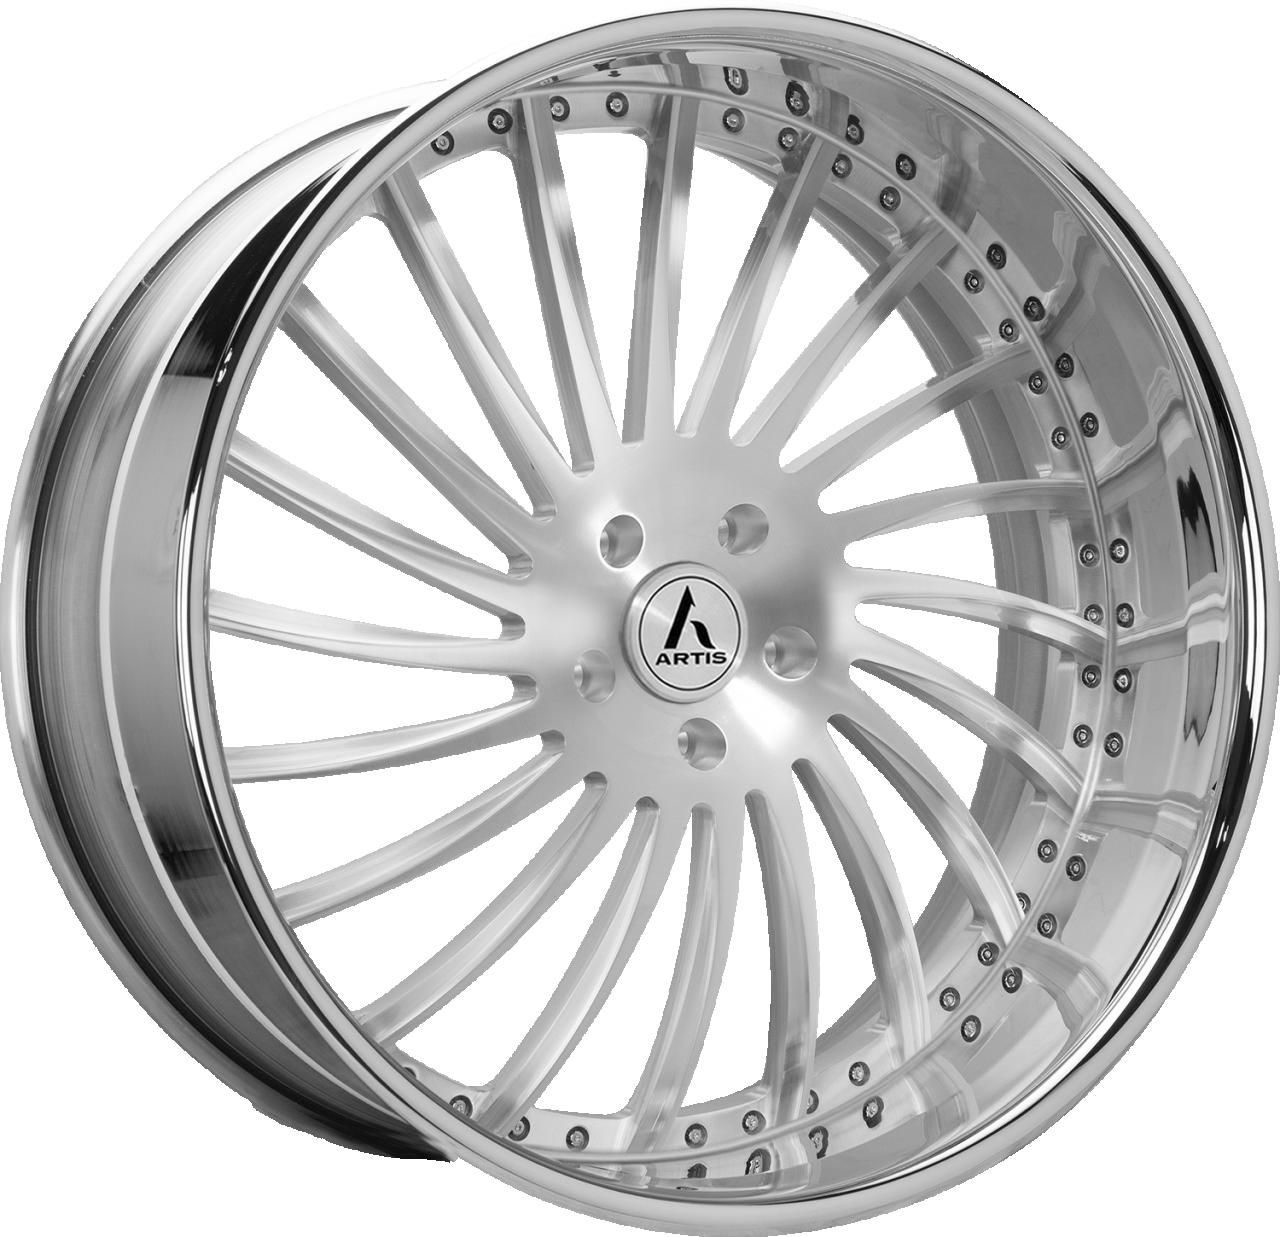 Artis Forged International-M wheel with Brushed finish